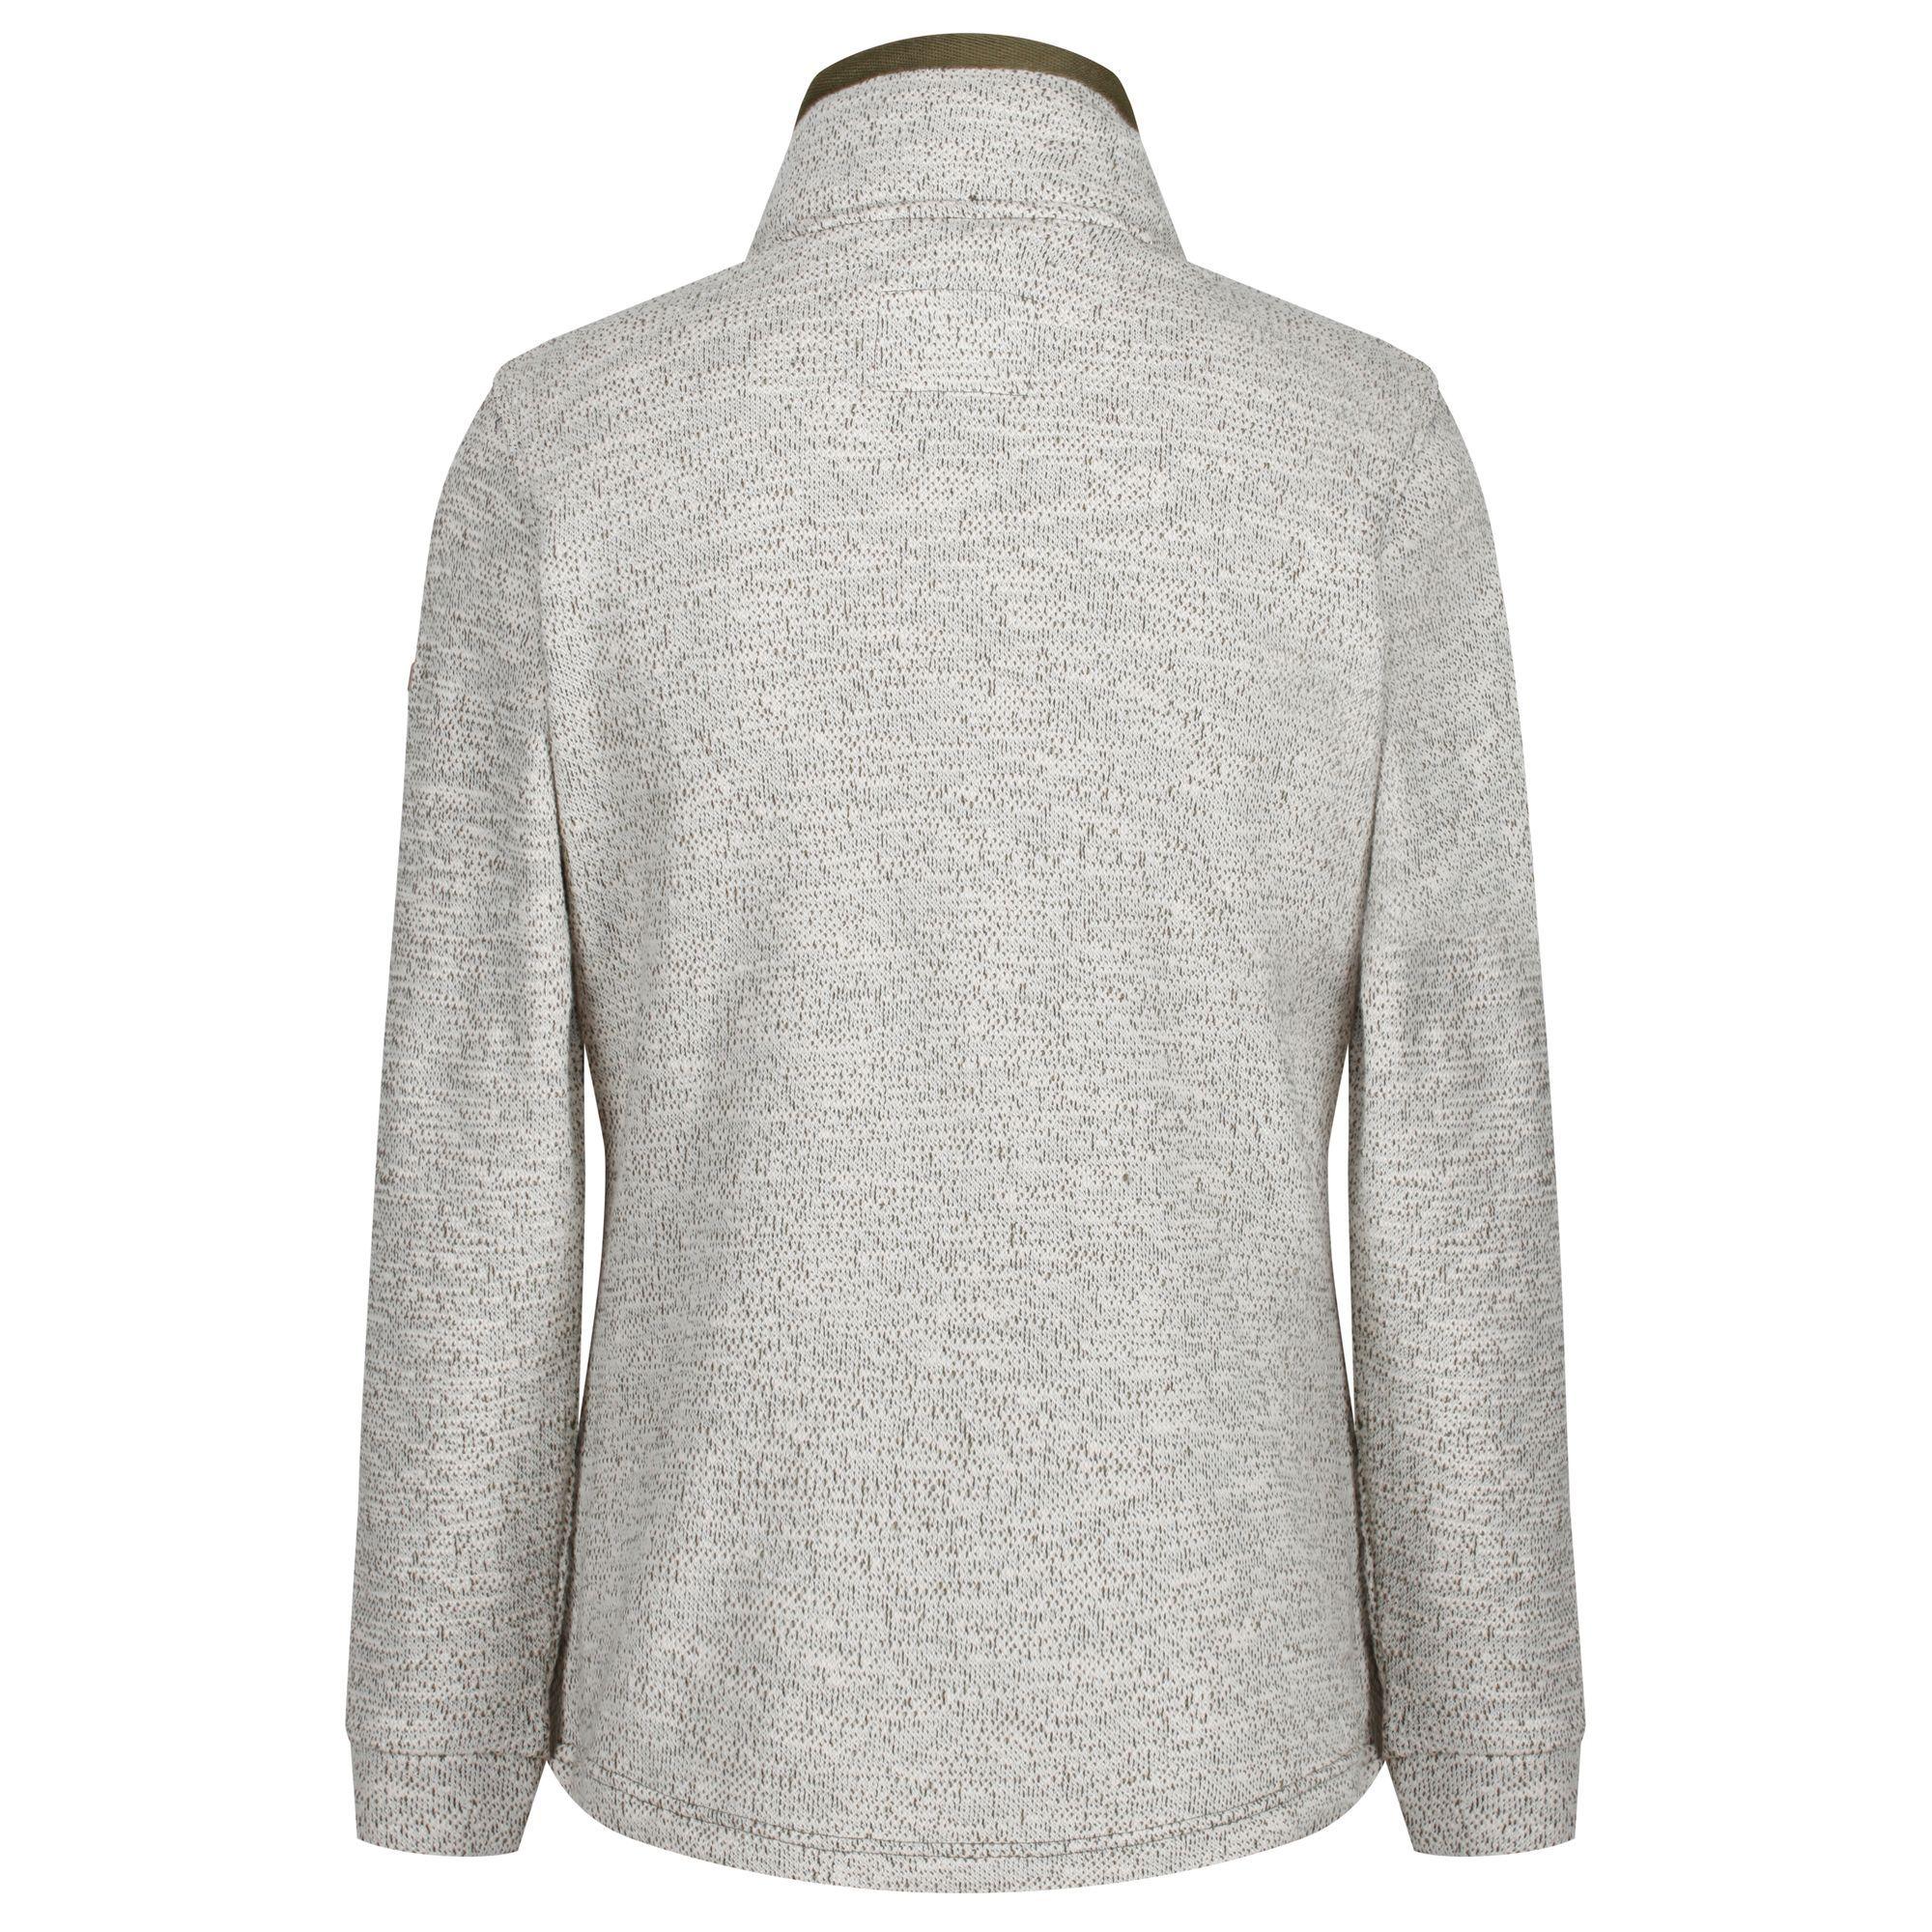 Regatta-Odetta-Womens-Warm-Curved-Full-Zip-Fleece-Jacket-RRP-50 thumbnail 9